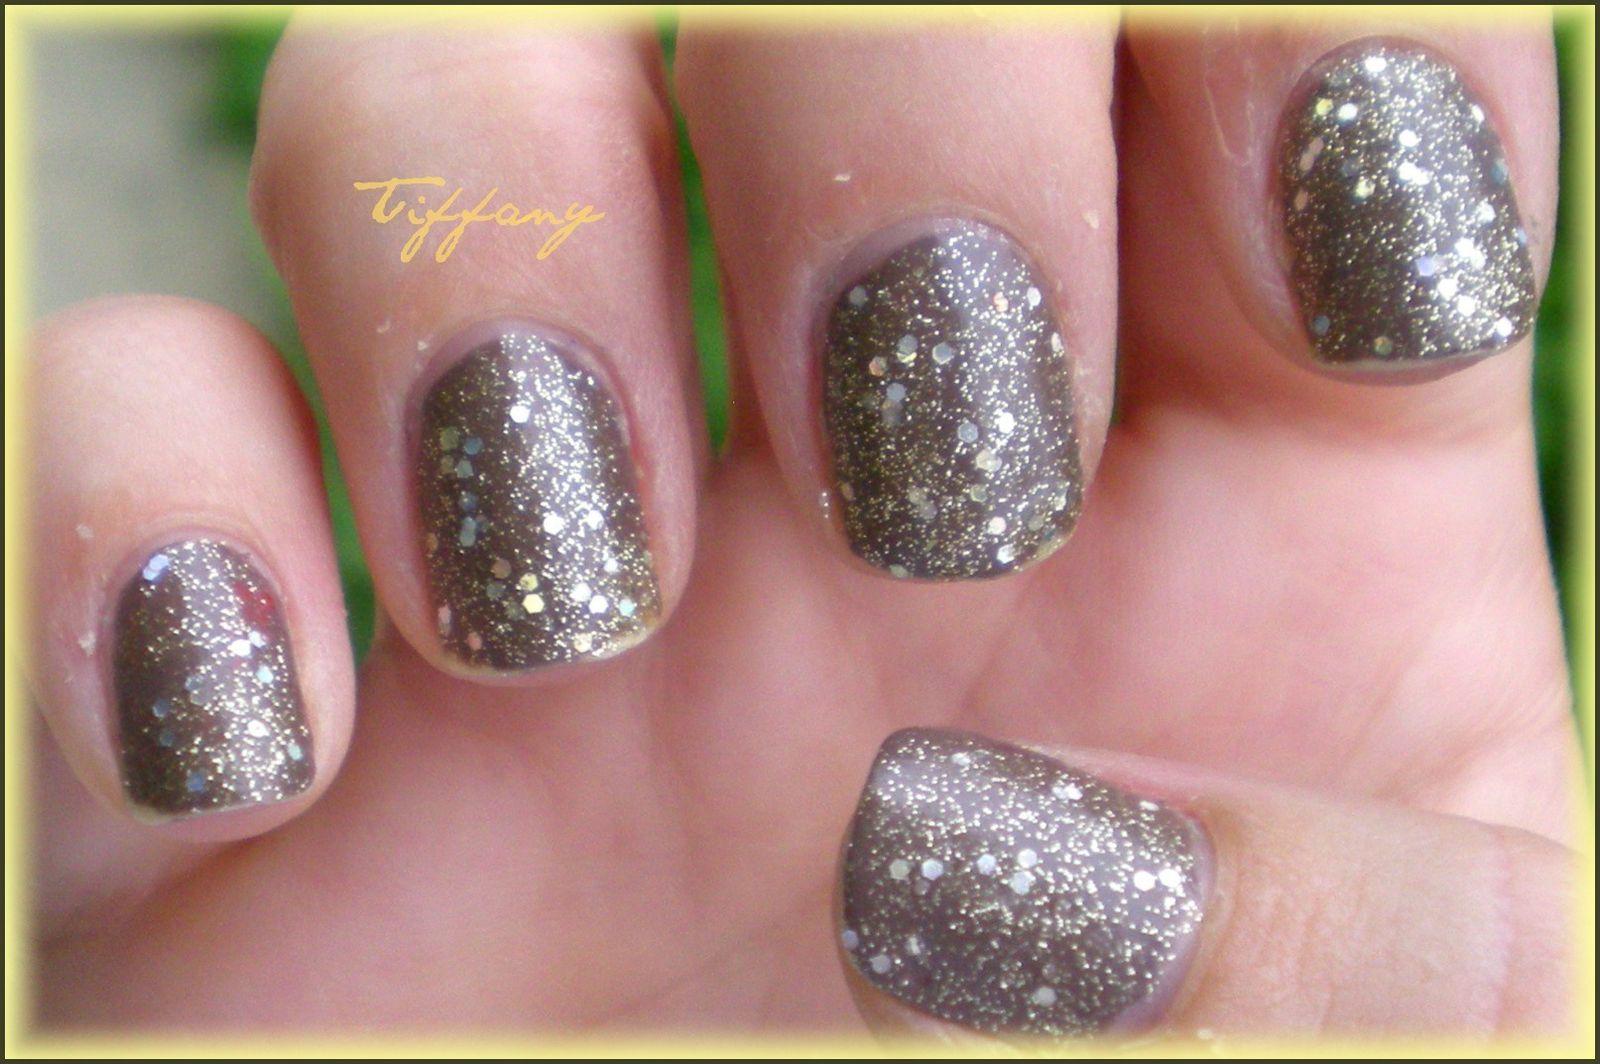 ELF Golden Goddess - Smocky brown